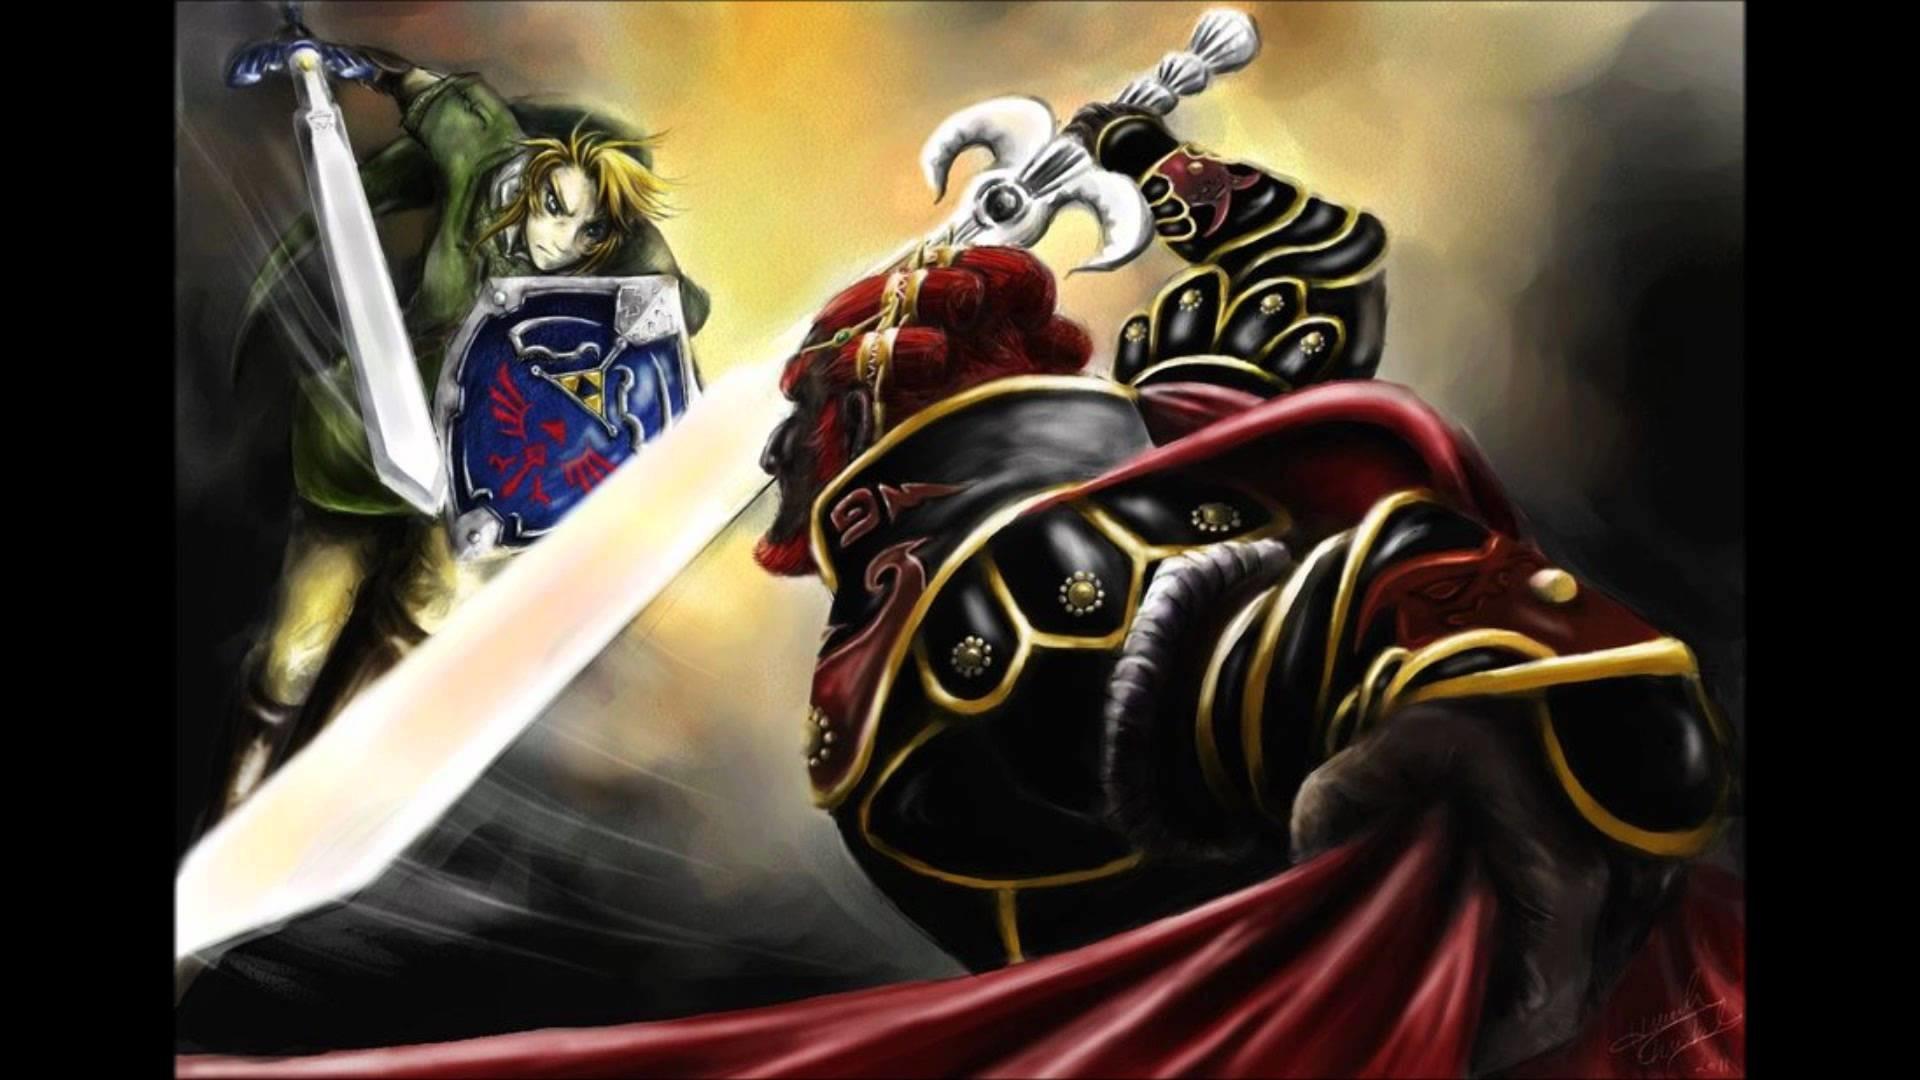 Zelda-Twilight Princess Dark Lord Ganondorf Shadow Remix